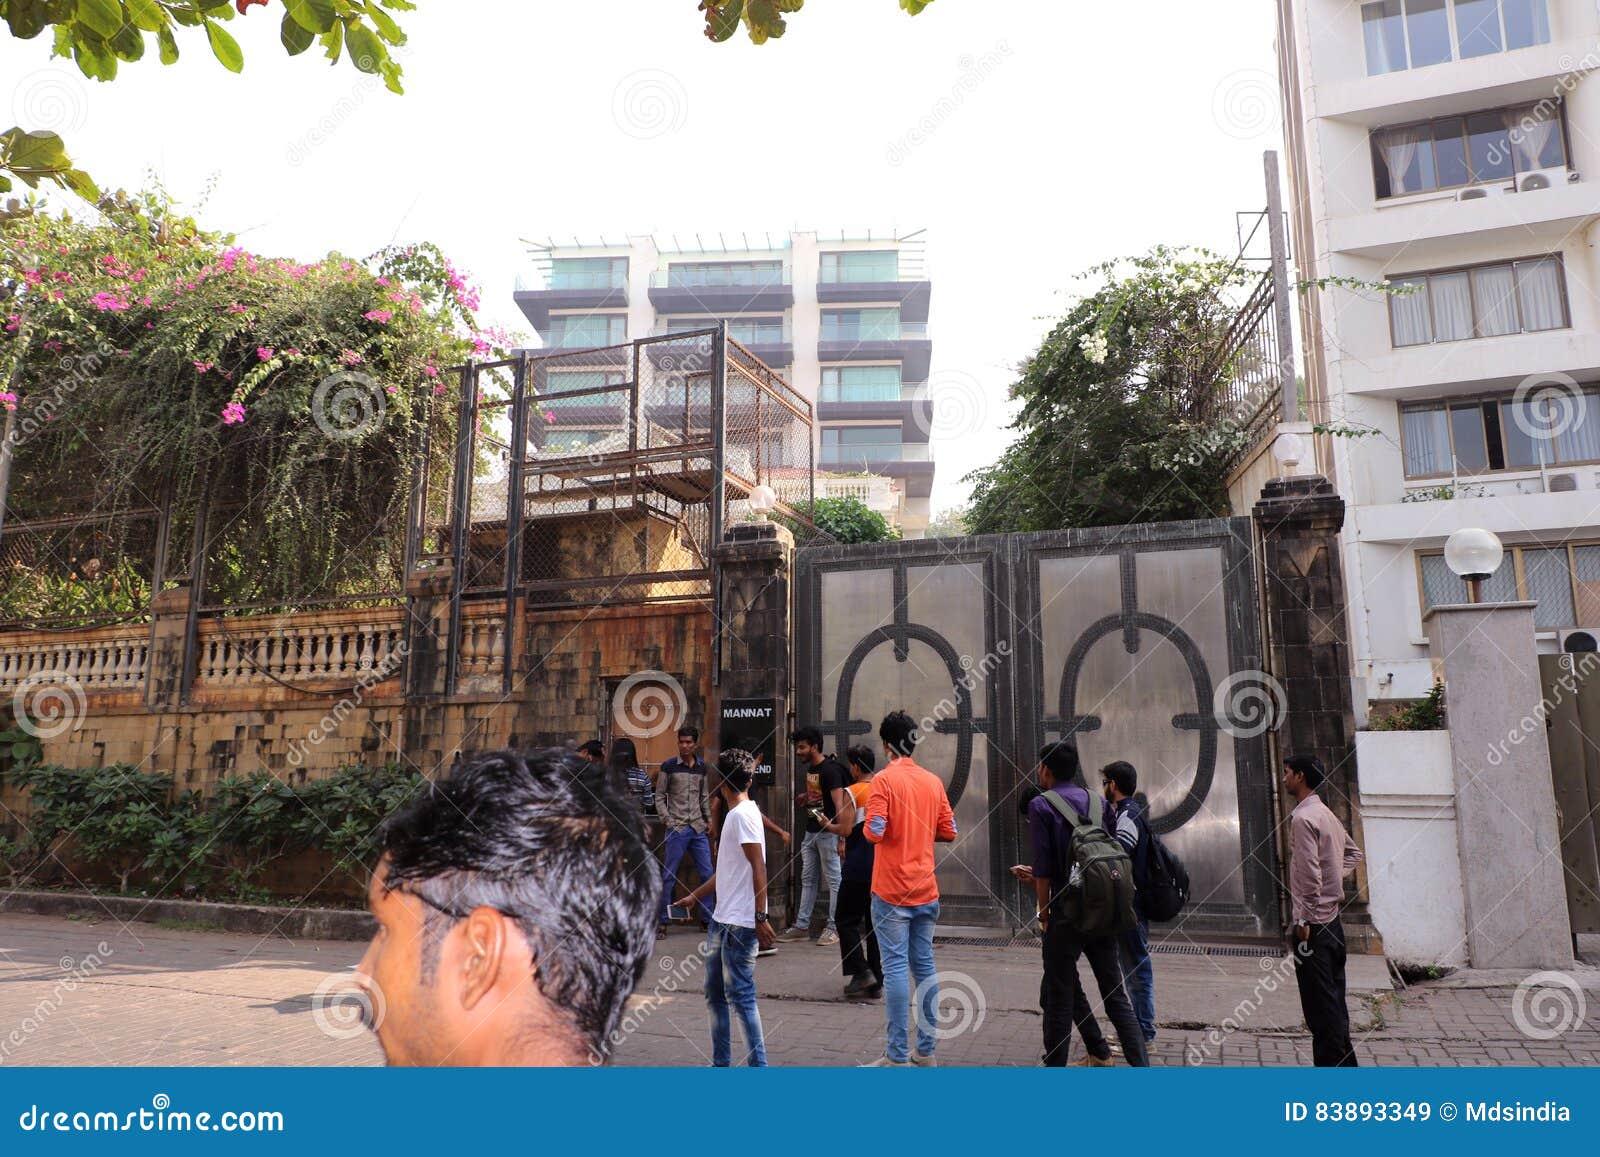 Mannat Bandra Mumbai Editorial Stock Image Image Of